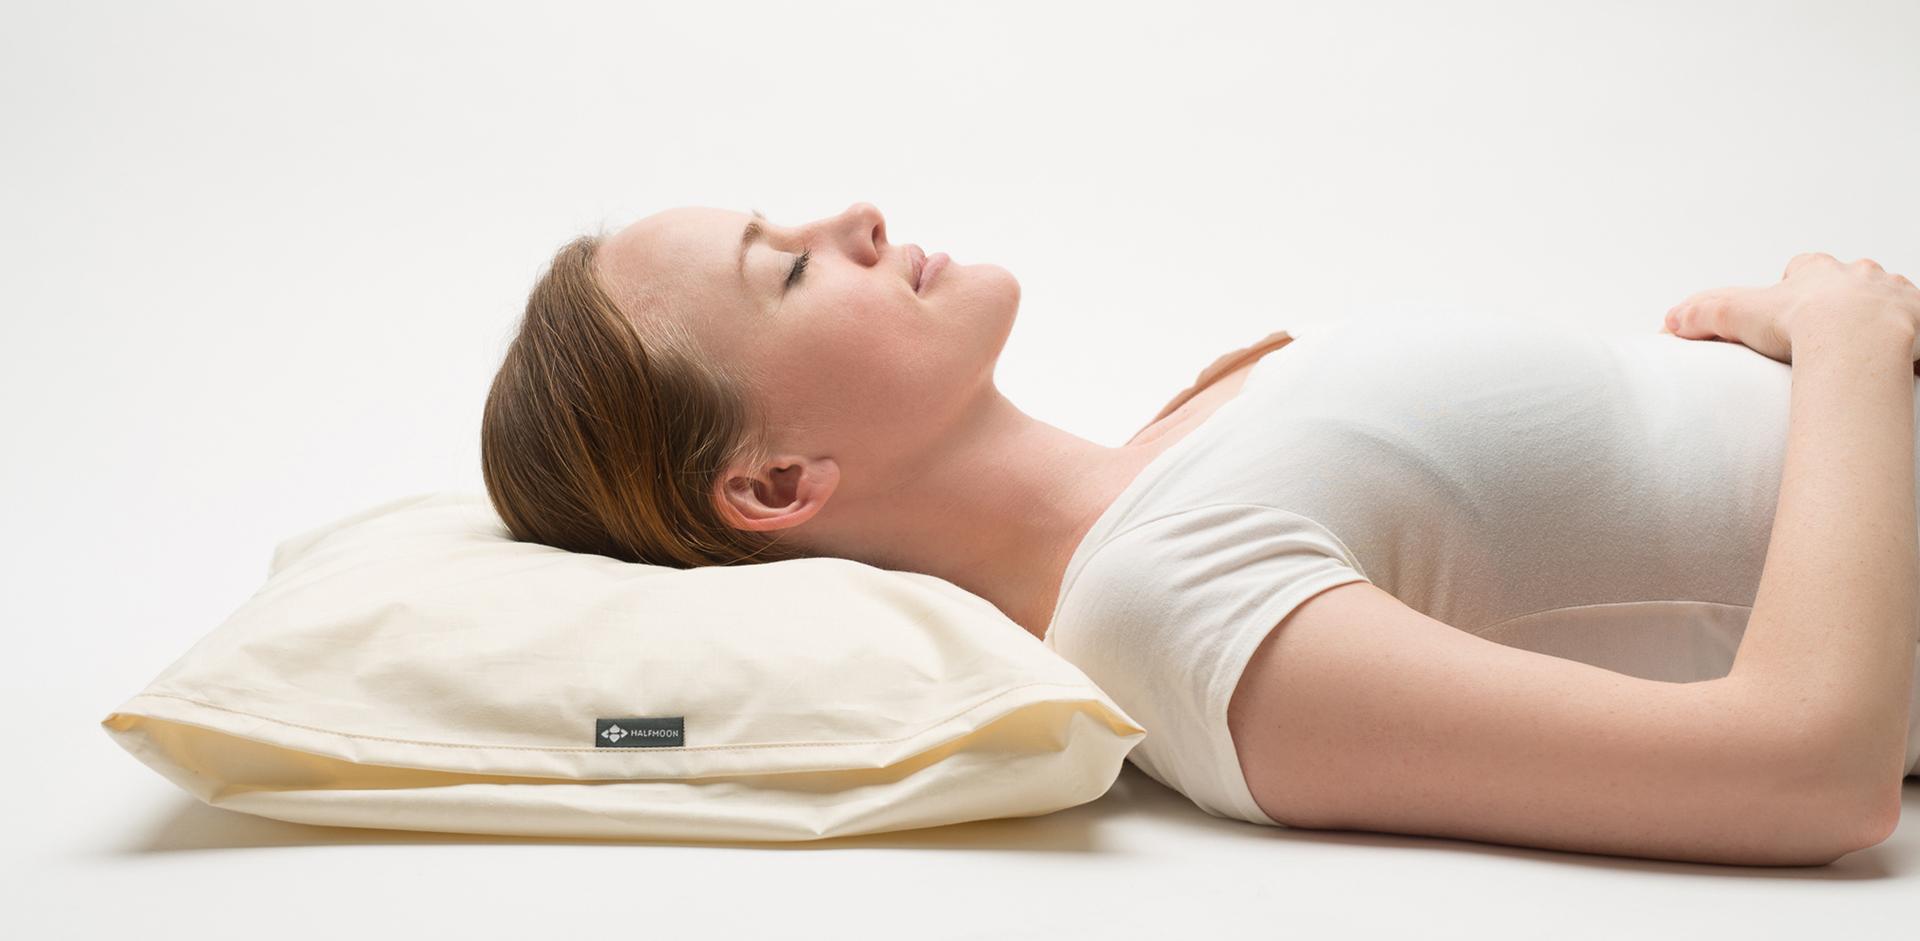 Buckwheat Pillow Benefits | Where to Buy Buckwheat Pillows | Wheat Pillow